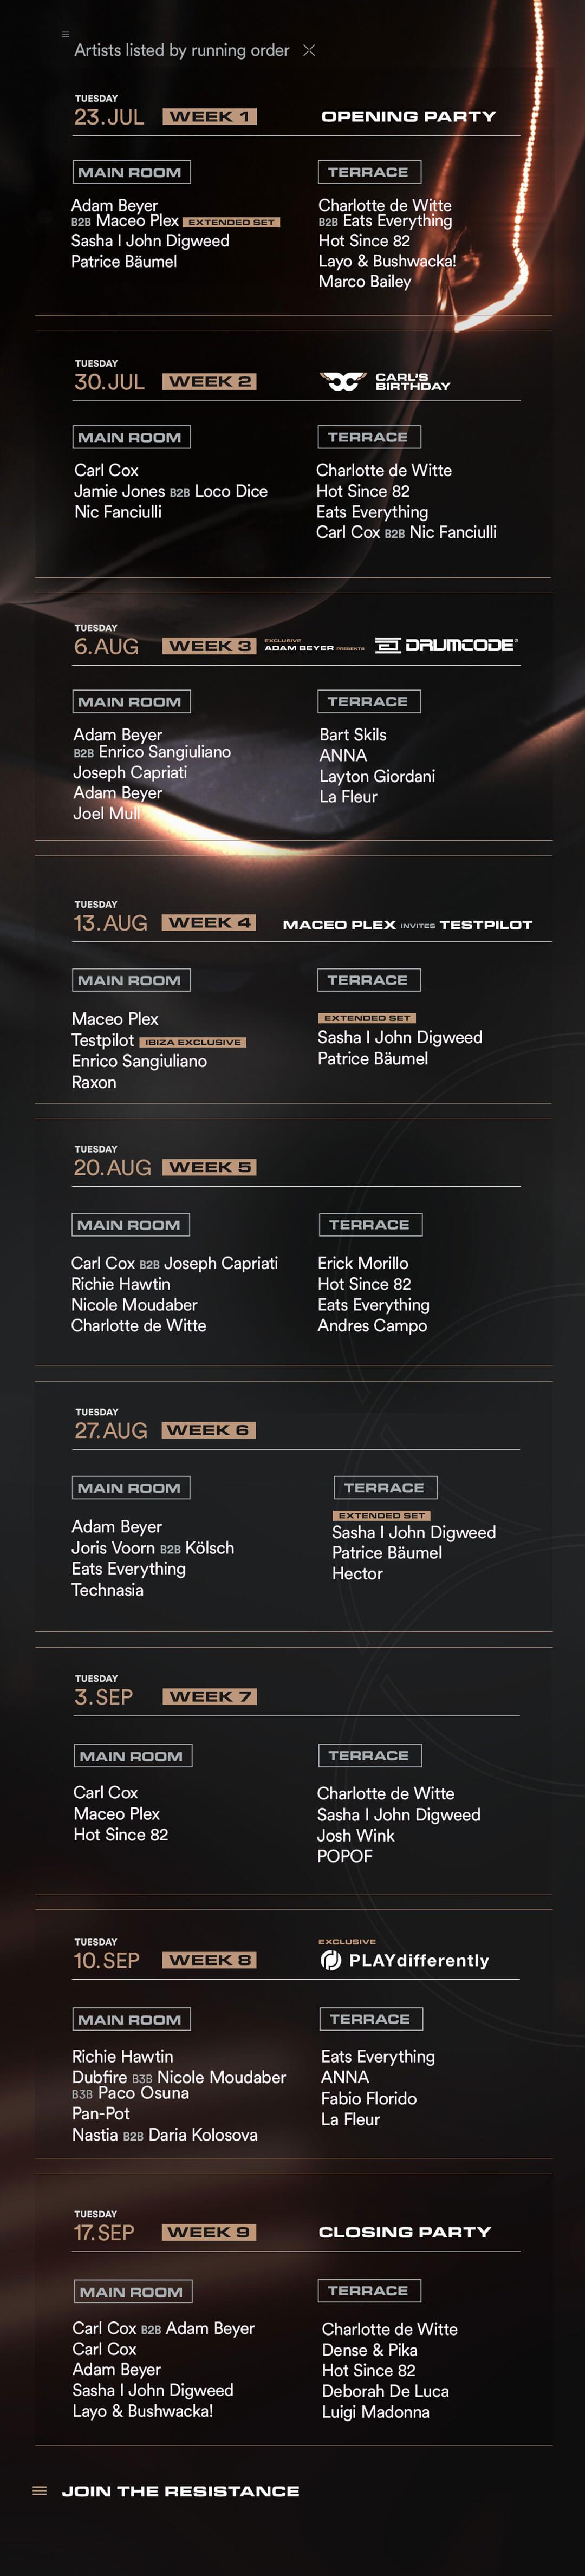 season lineup